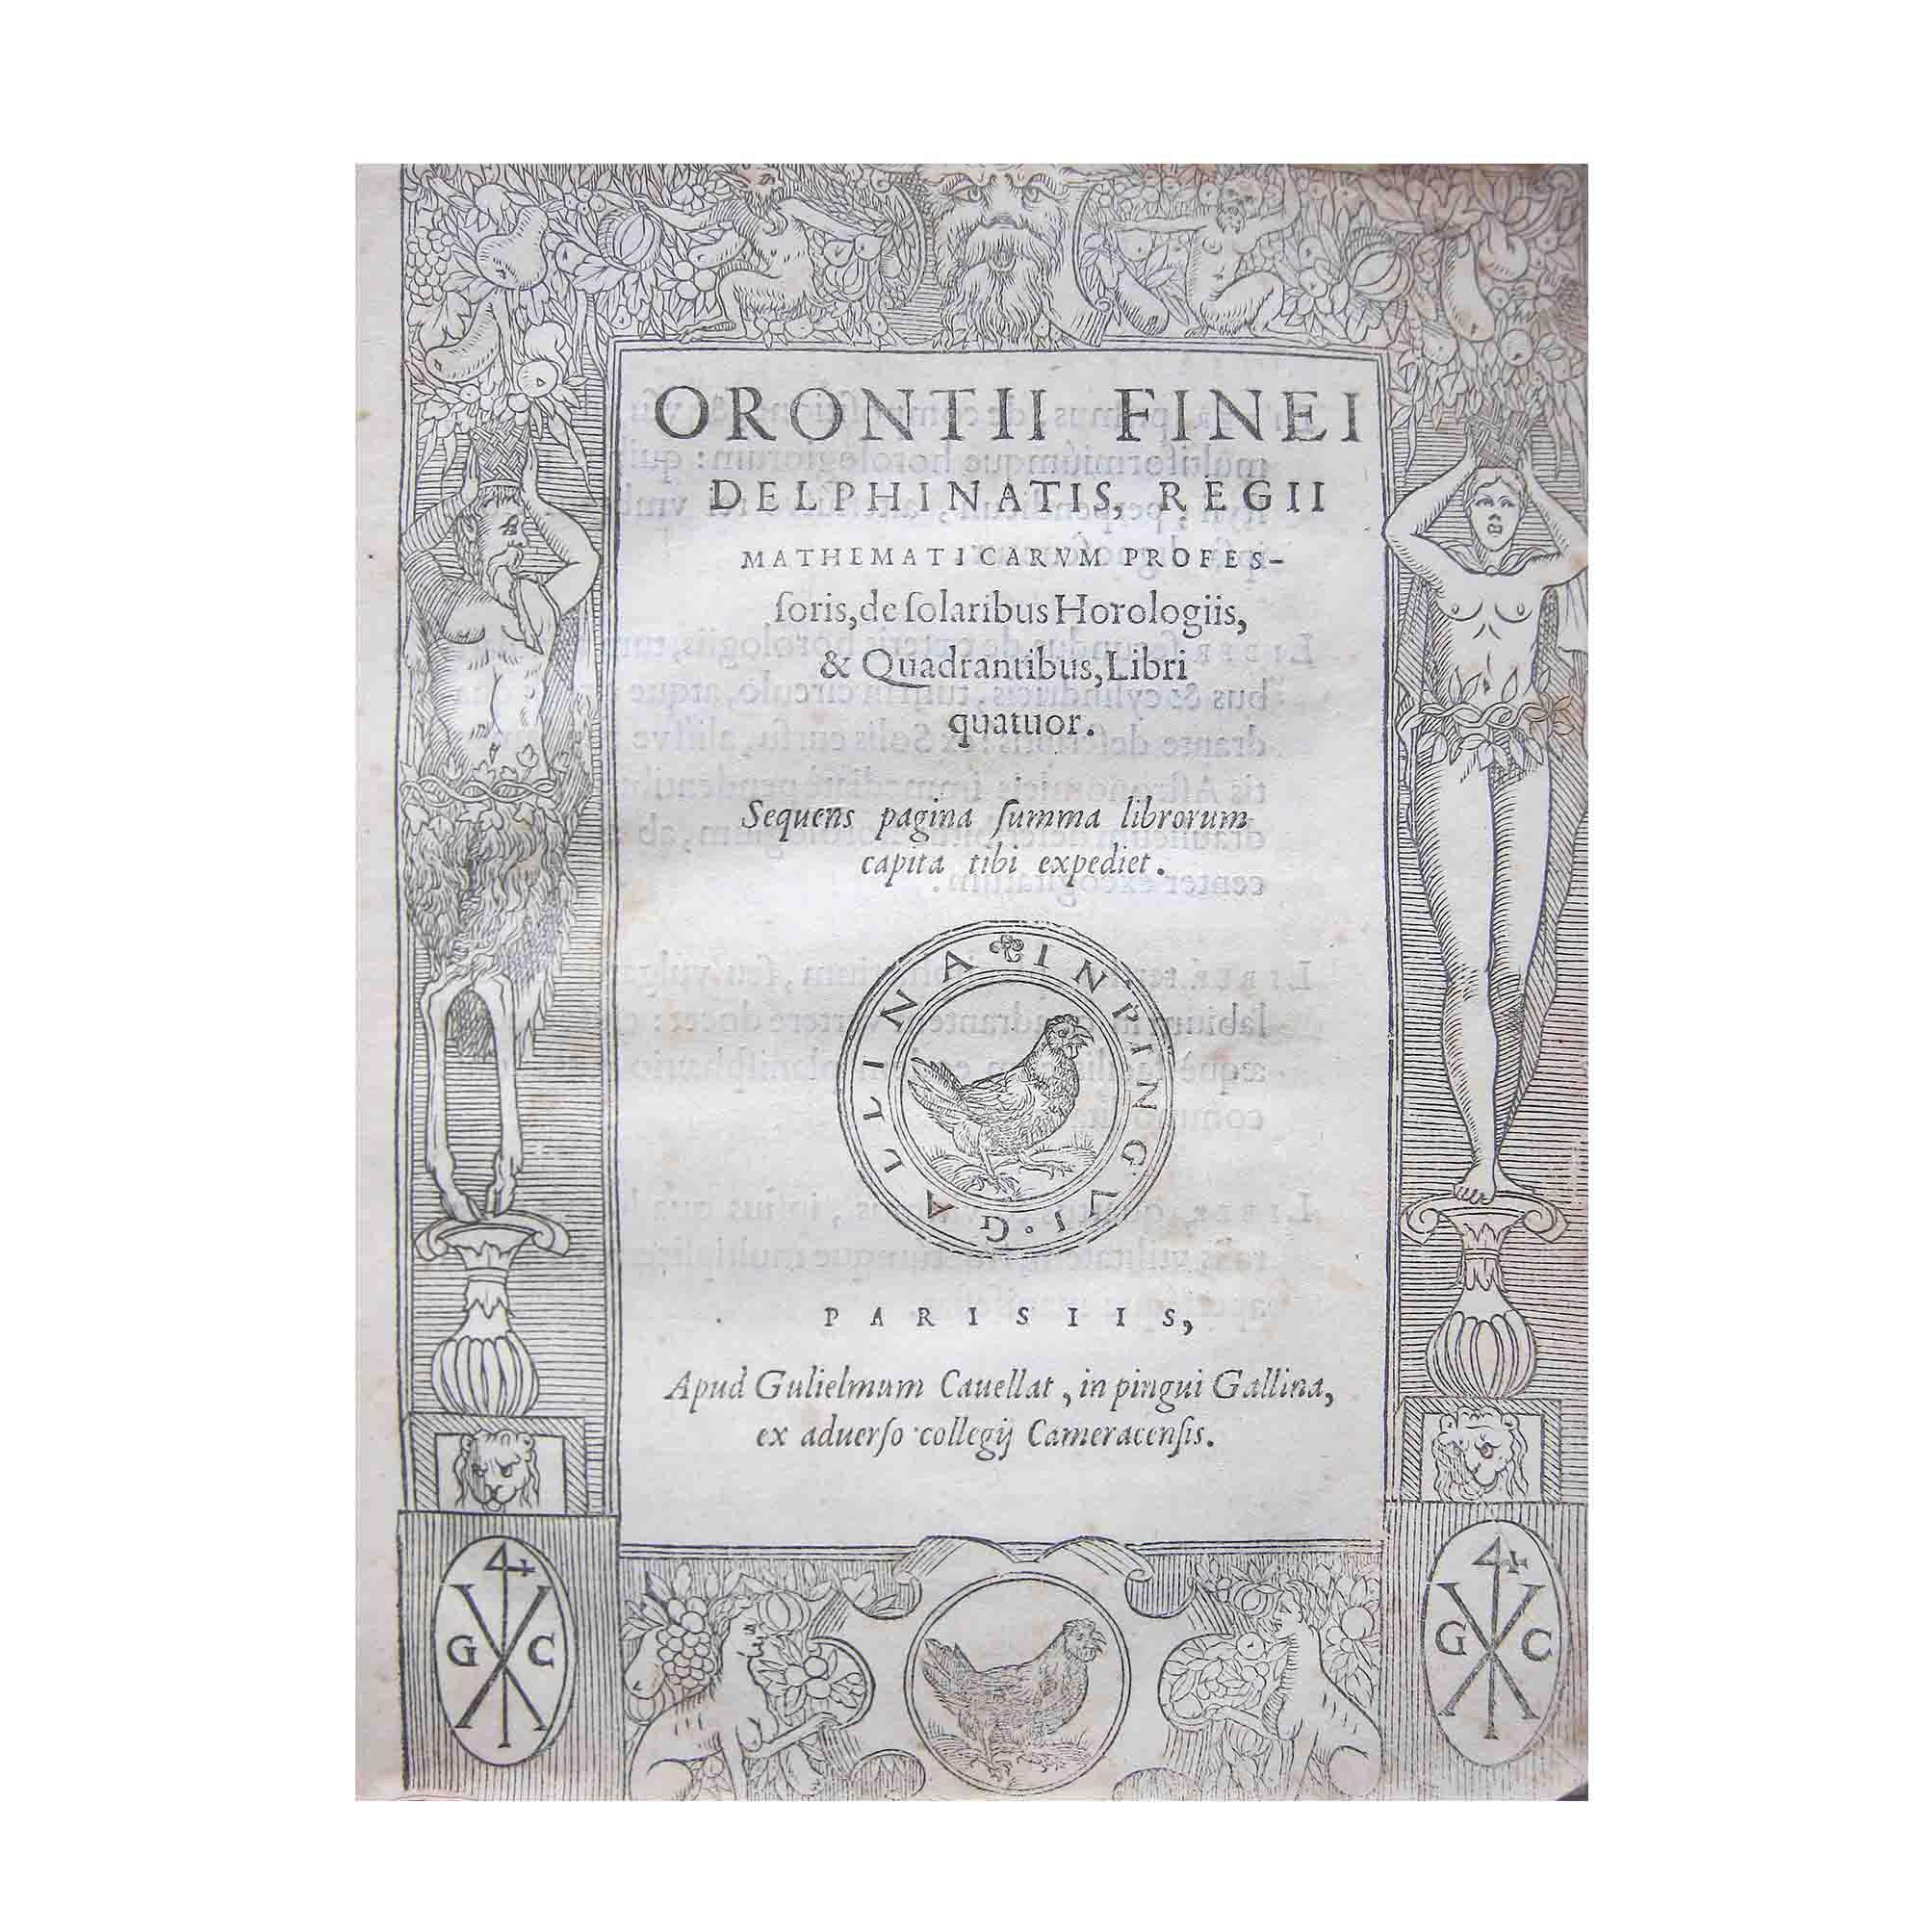 Fine-Solaribus-Horologiis-1560-Title-Woodcut-A-N.jpg